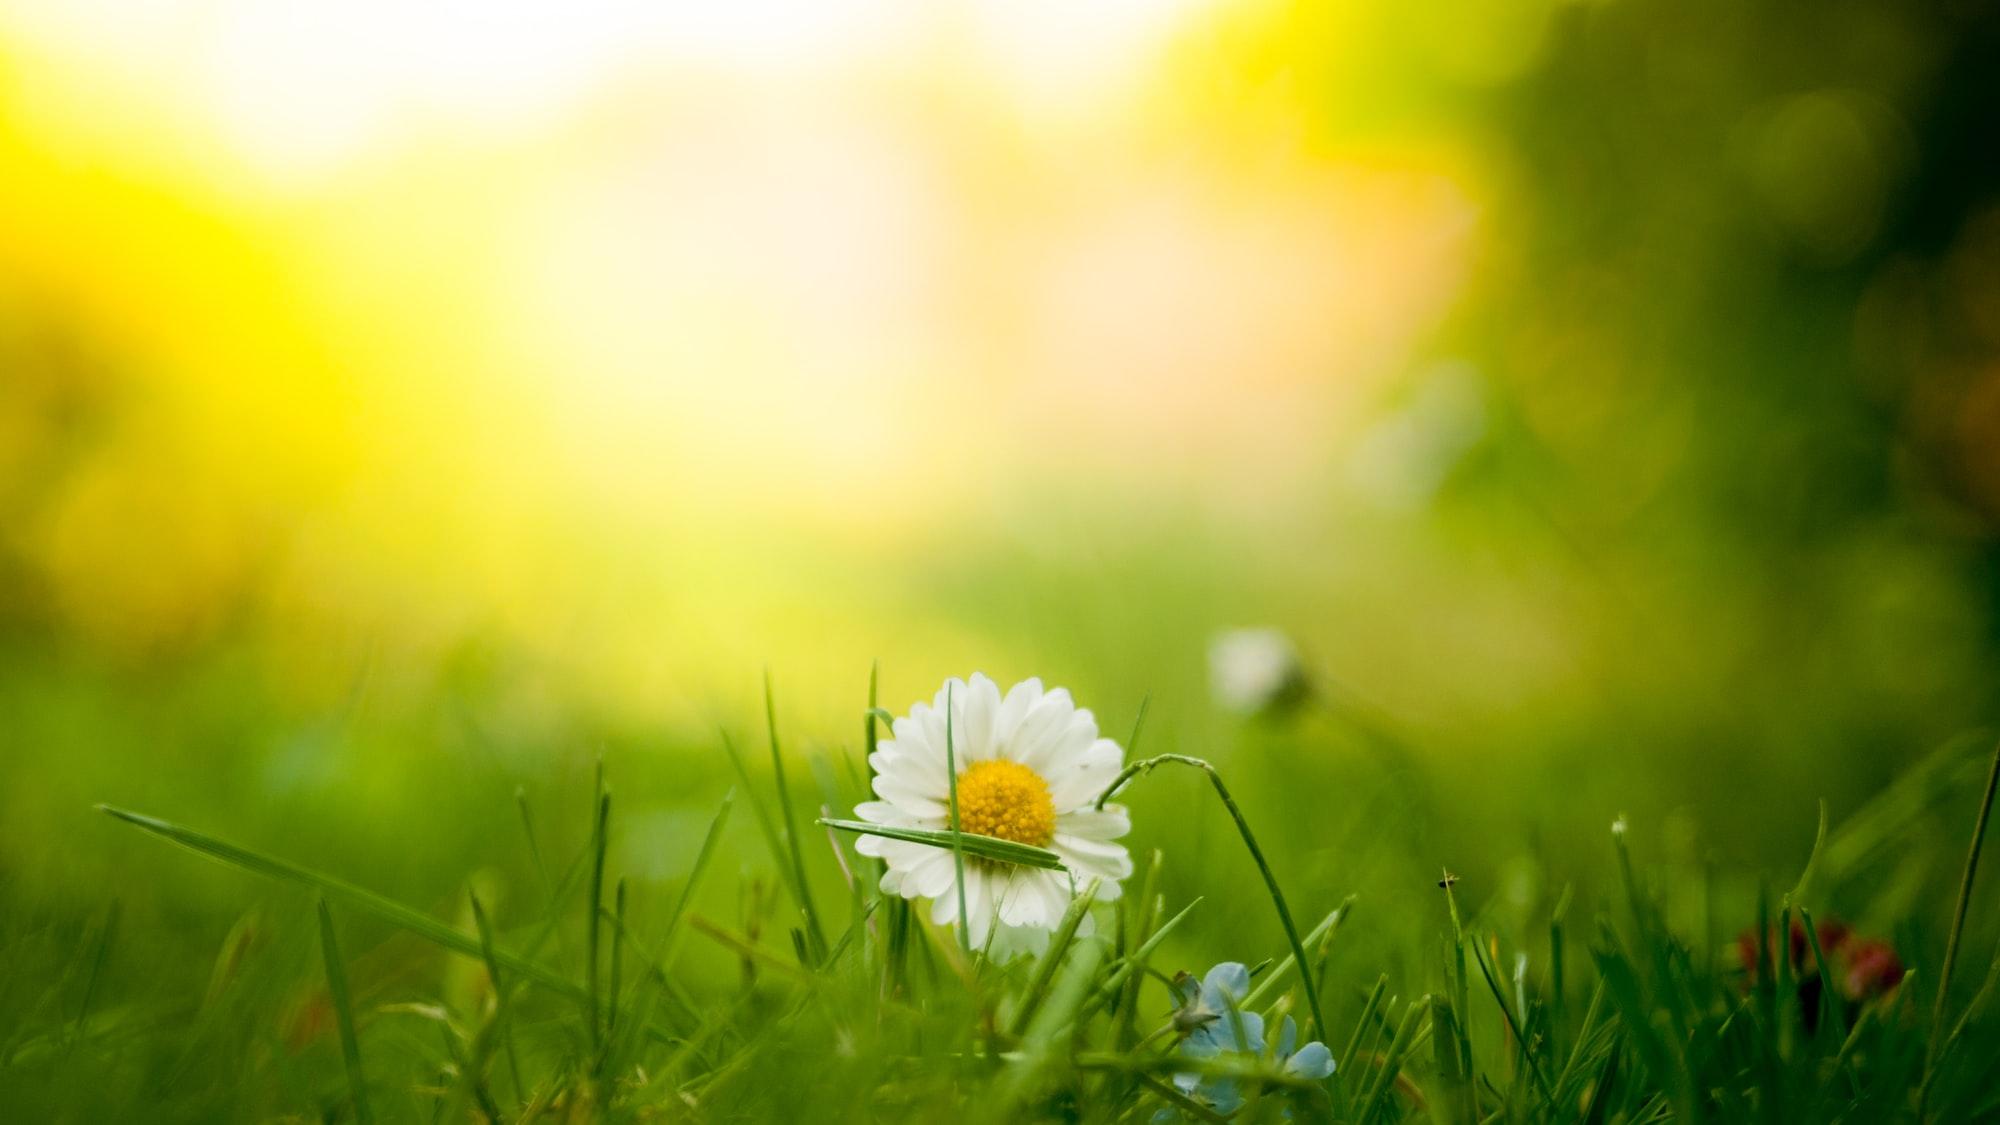 White daisy in grass